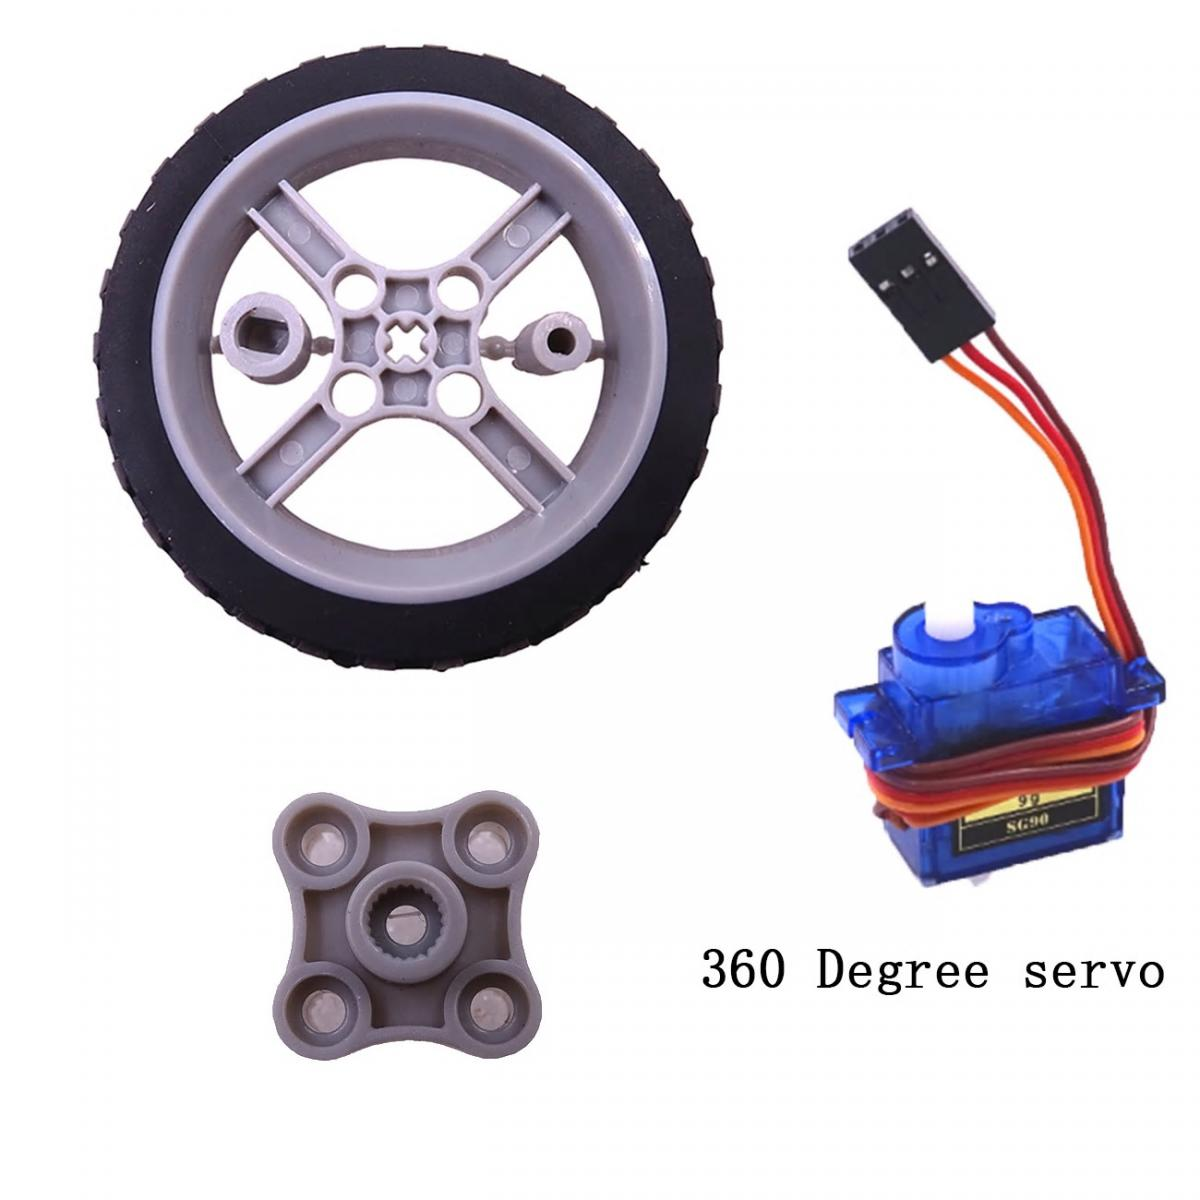 SG90 et roue Lego.jpg